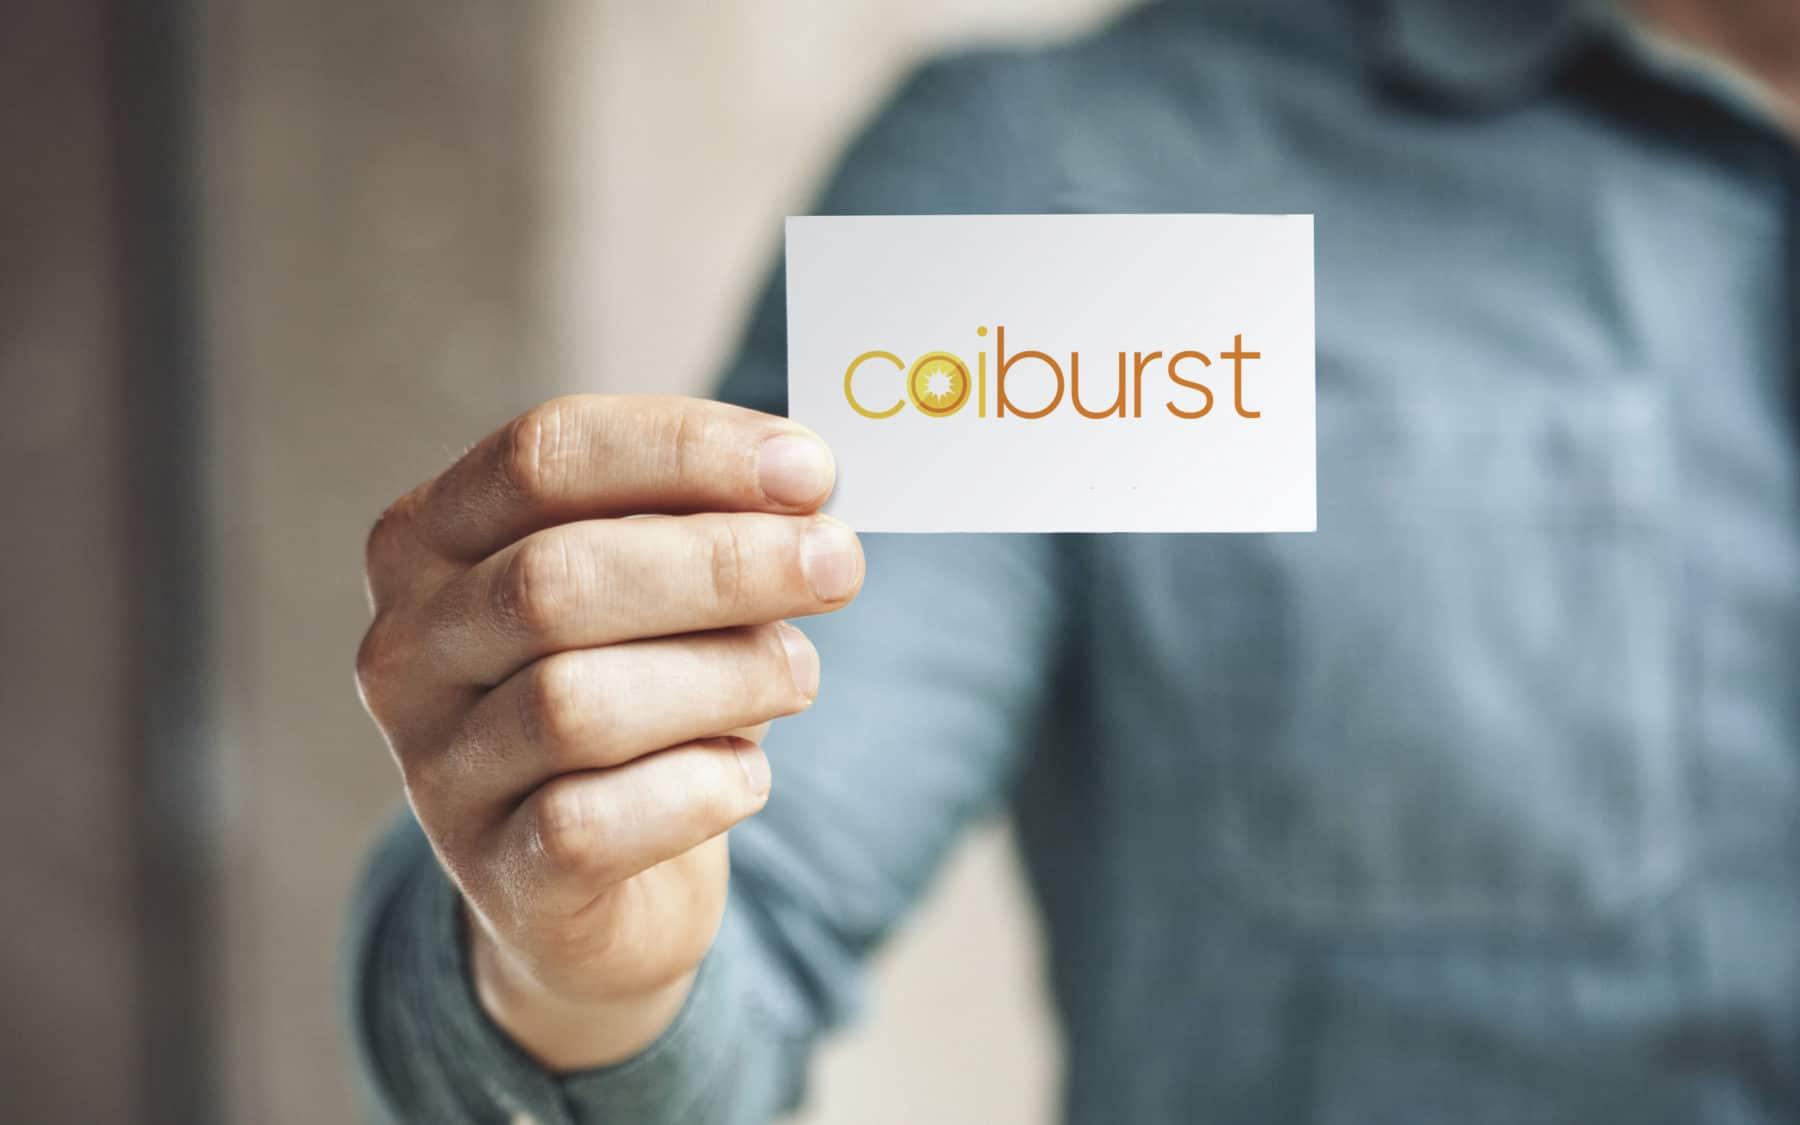 Coiburst 1